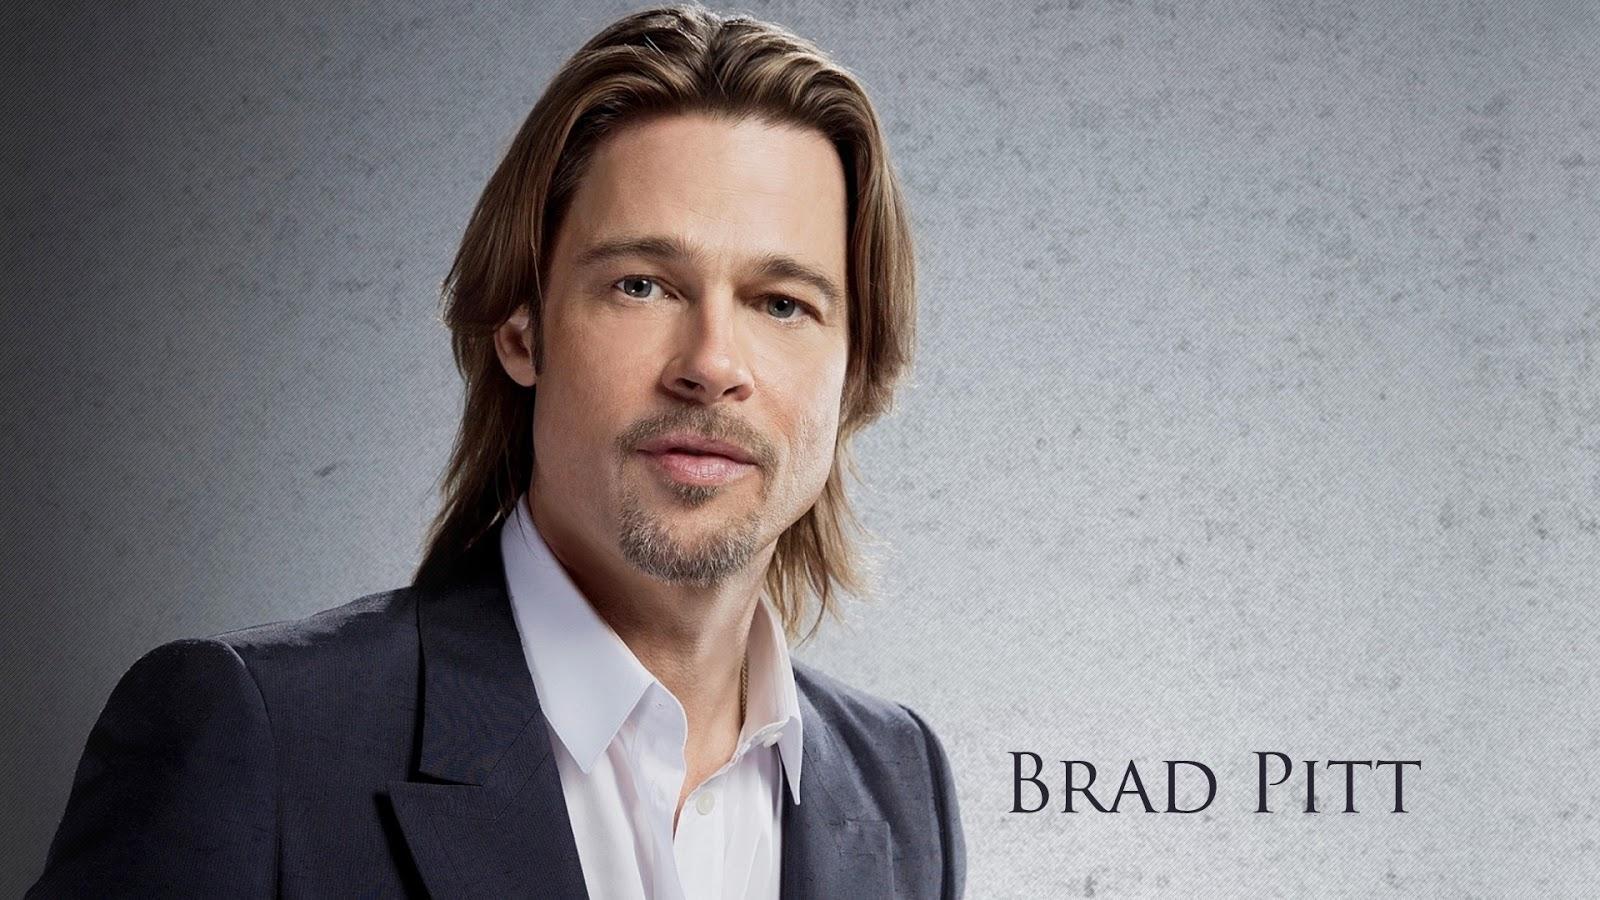 All Categories: Brad Pitt New HD